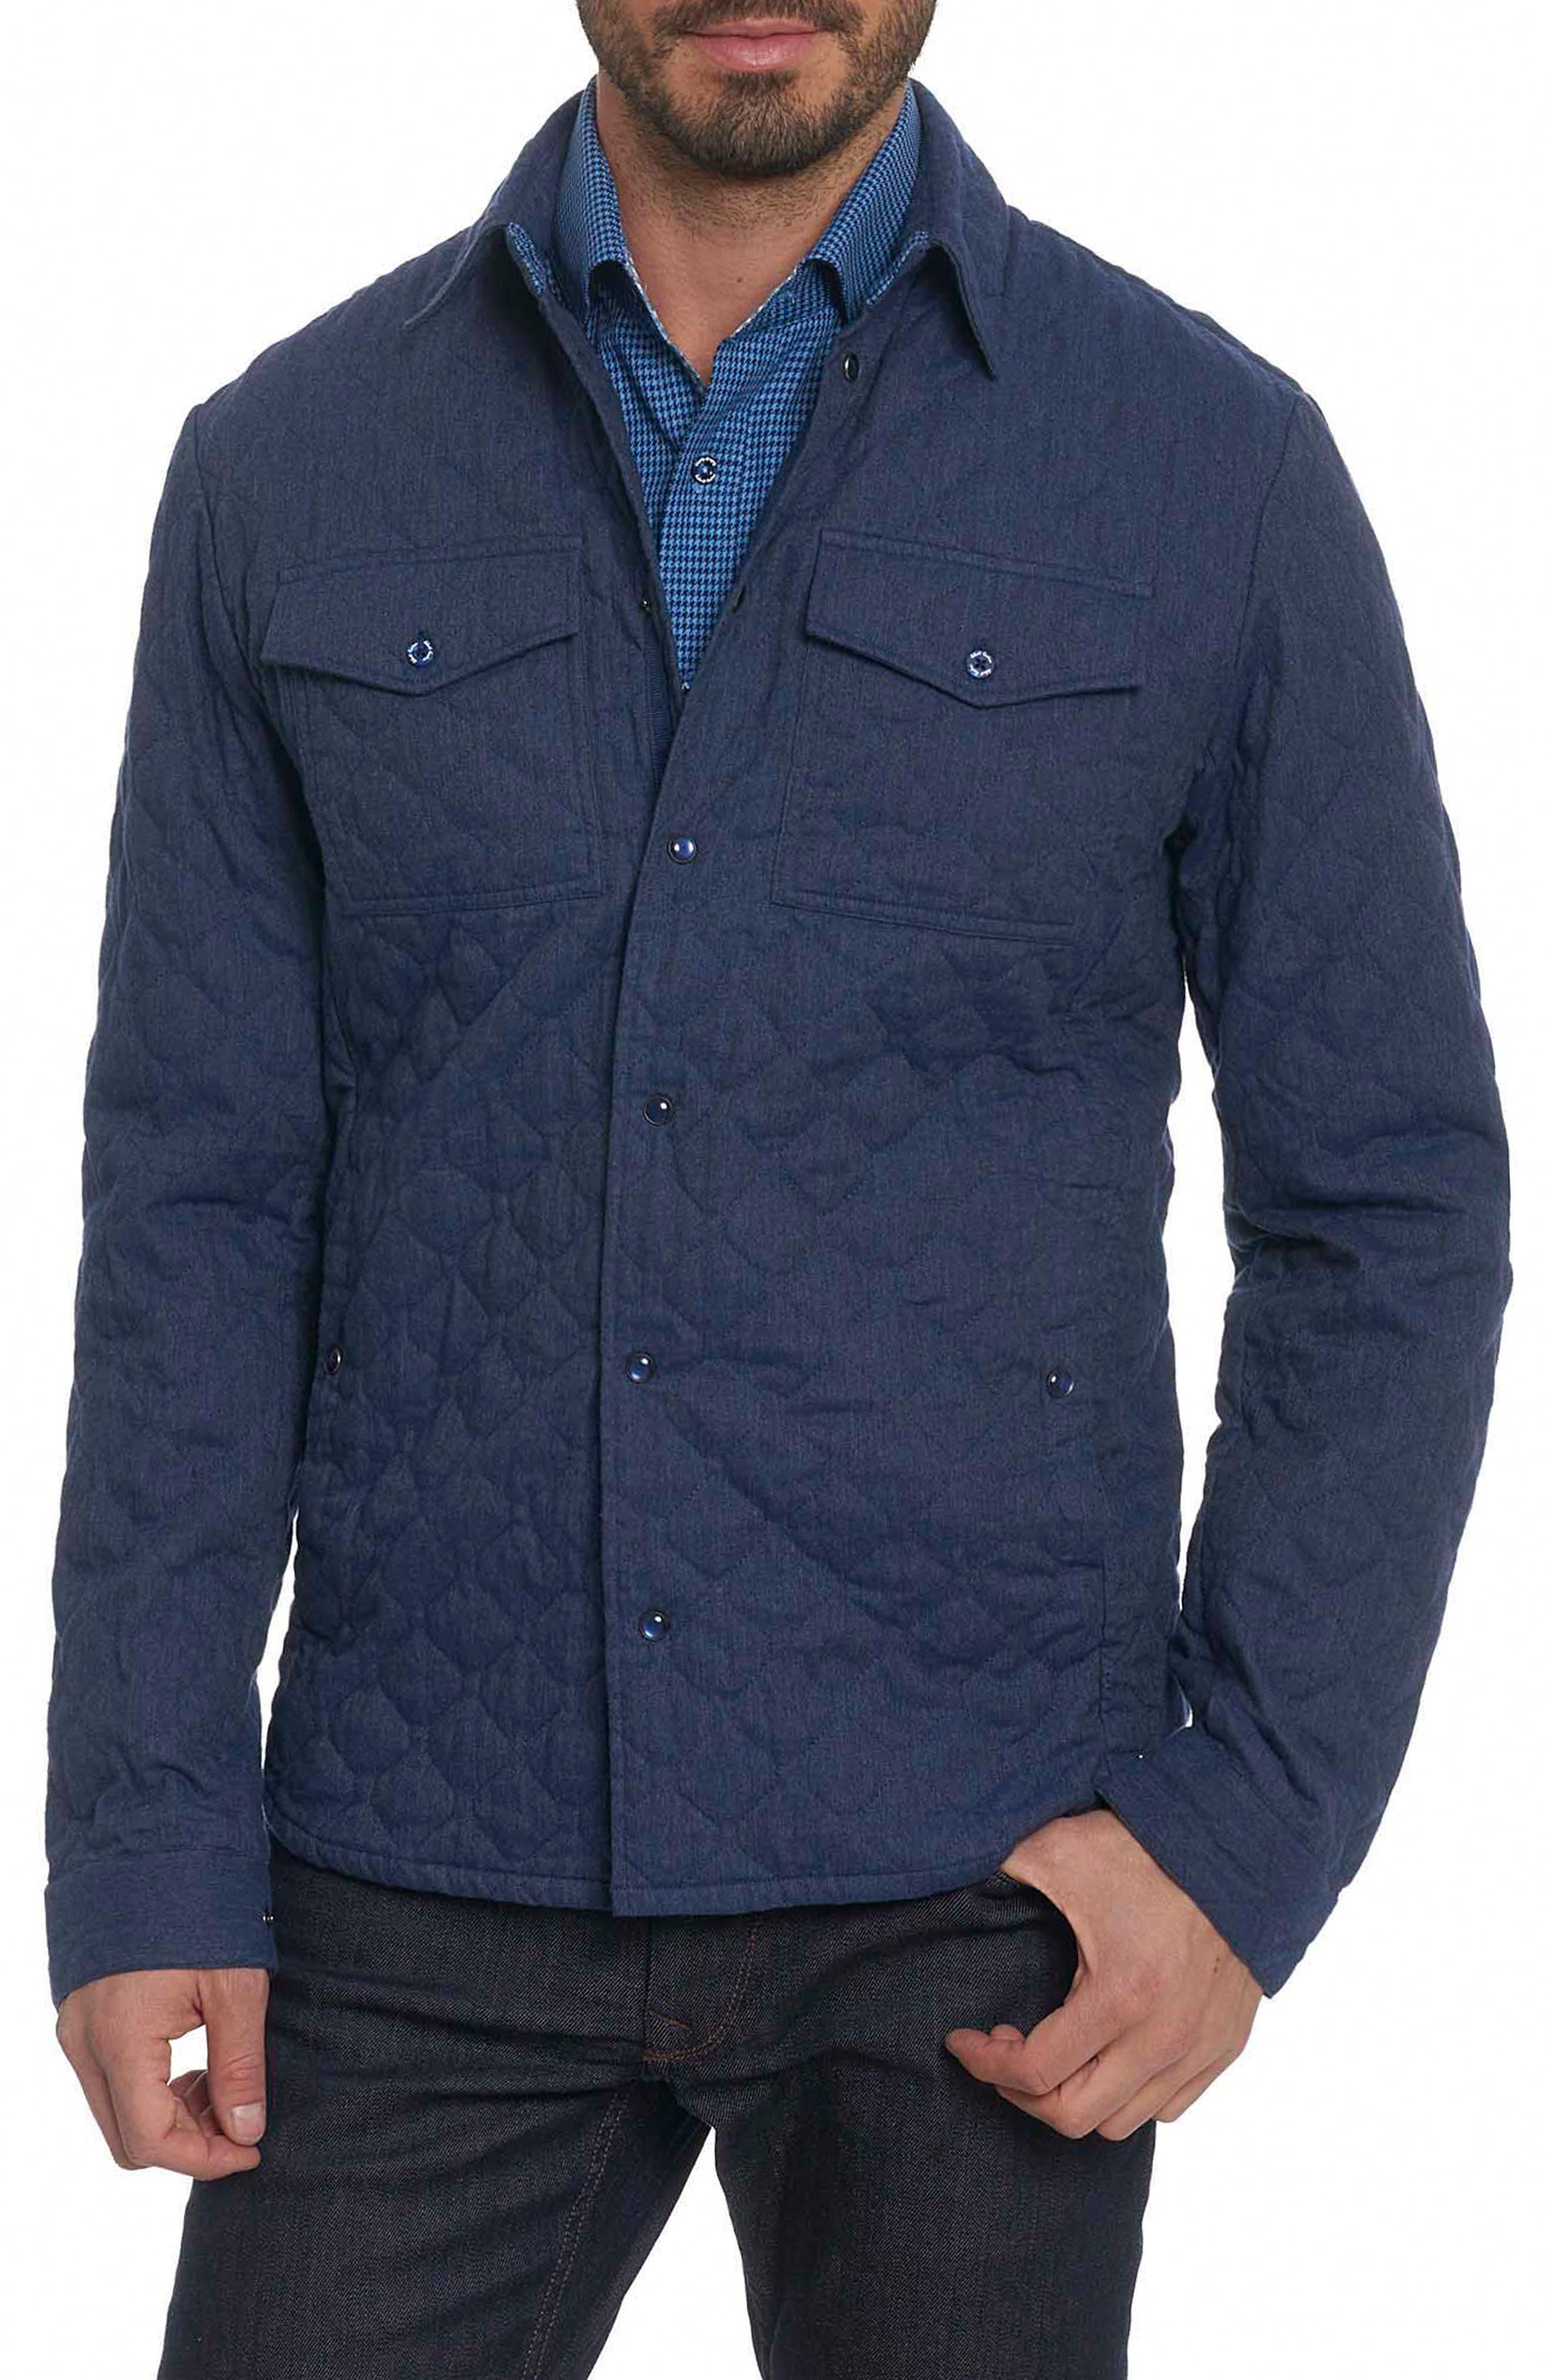 Alternate Image 1 Selected - Robert Graham Lance Quilted Shirt Jacket